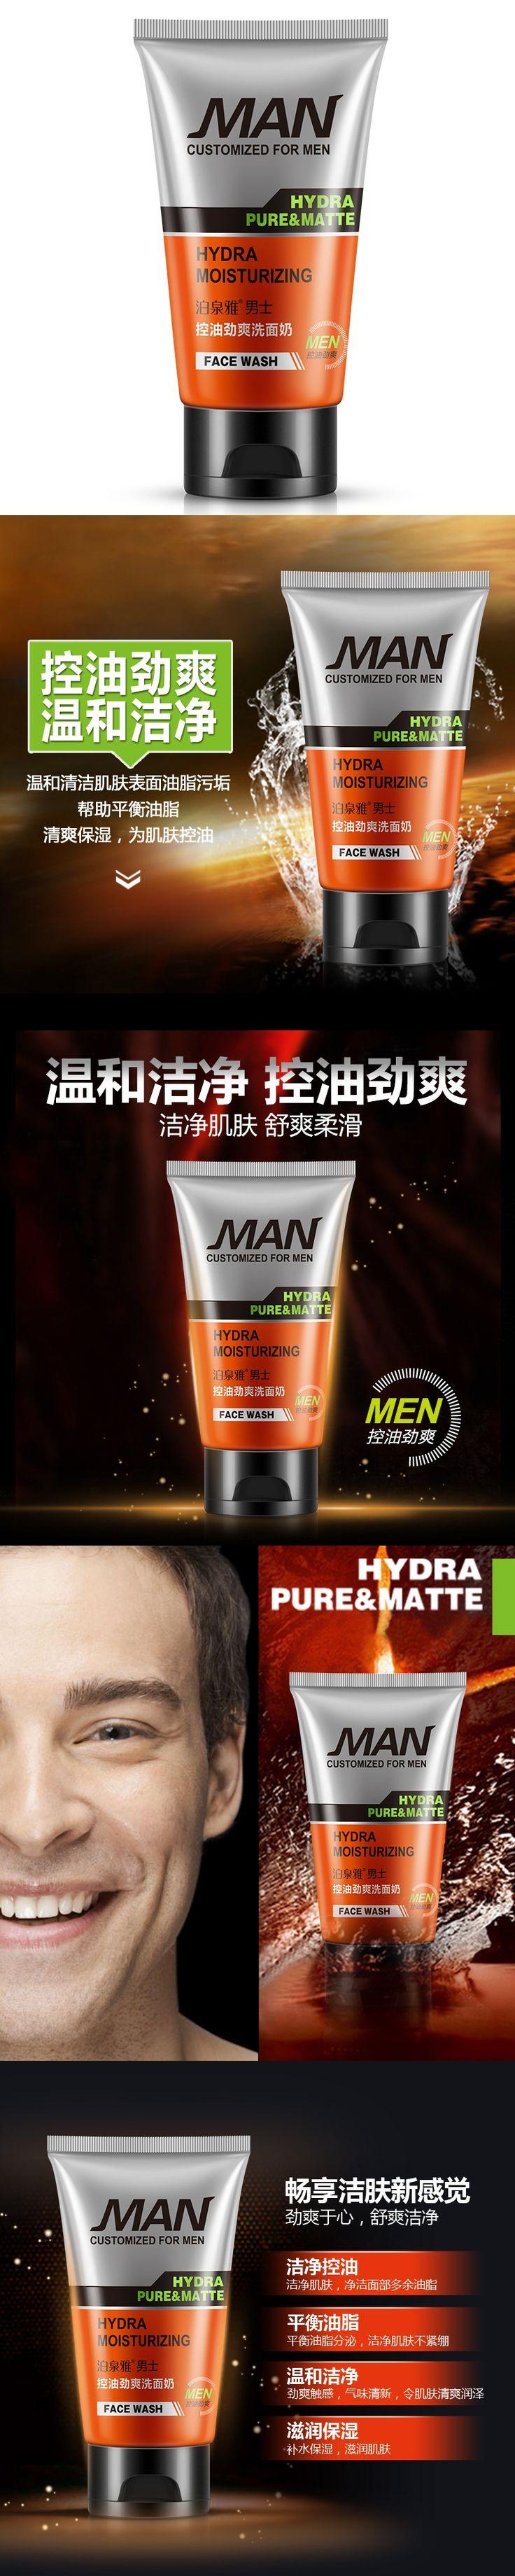 BIOAQUA Men's oil control Facial Cleanser Face Care Washable Oil Control Moisturizing Shrink Pores Blackhead Skin Care 100g